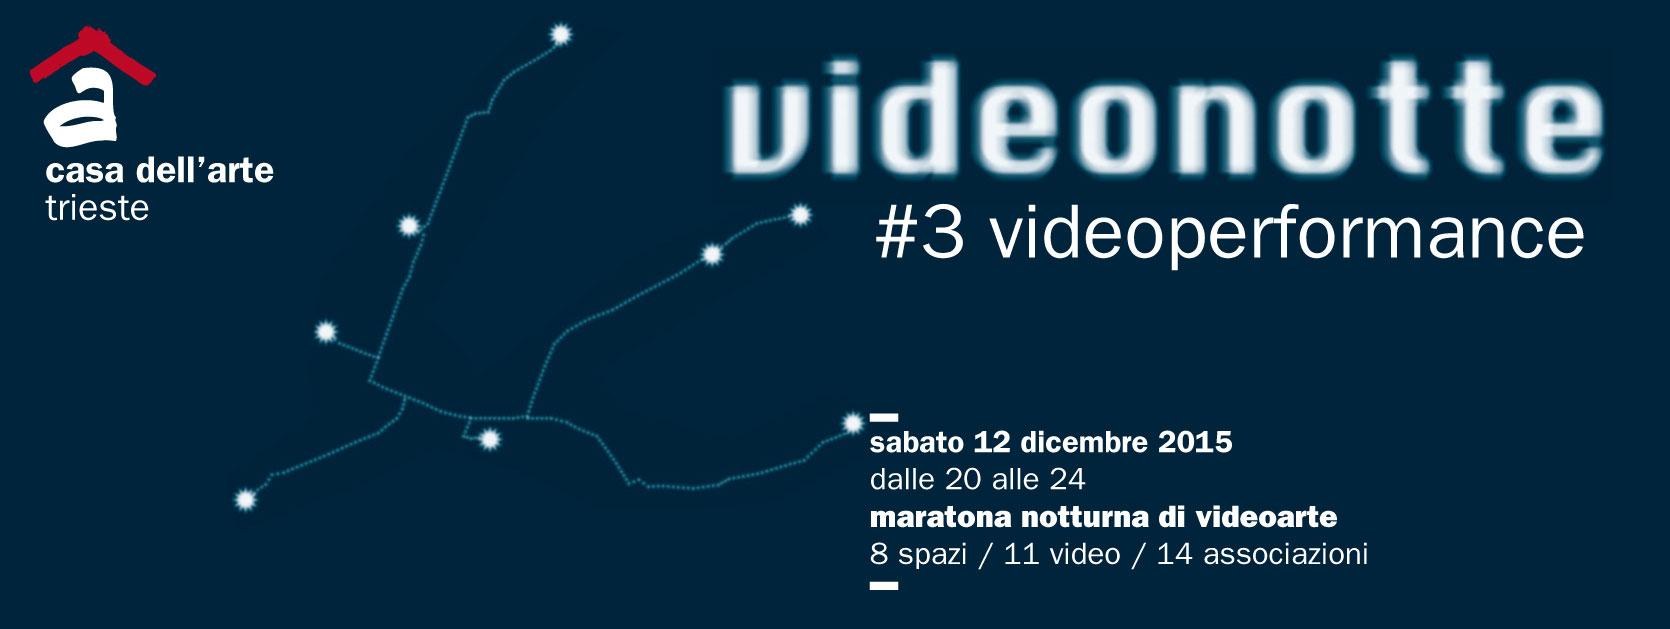 VIDEONOTTE-3-videoperformance